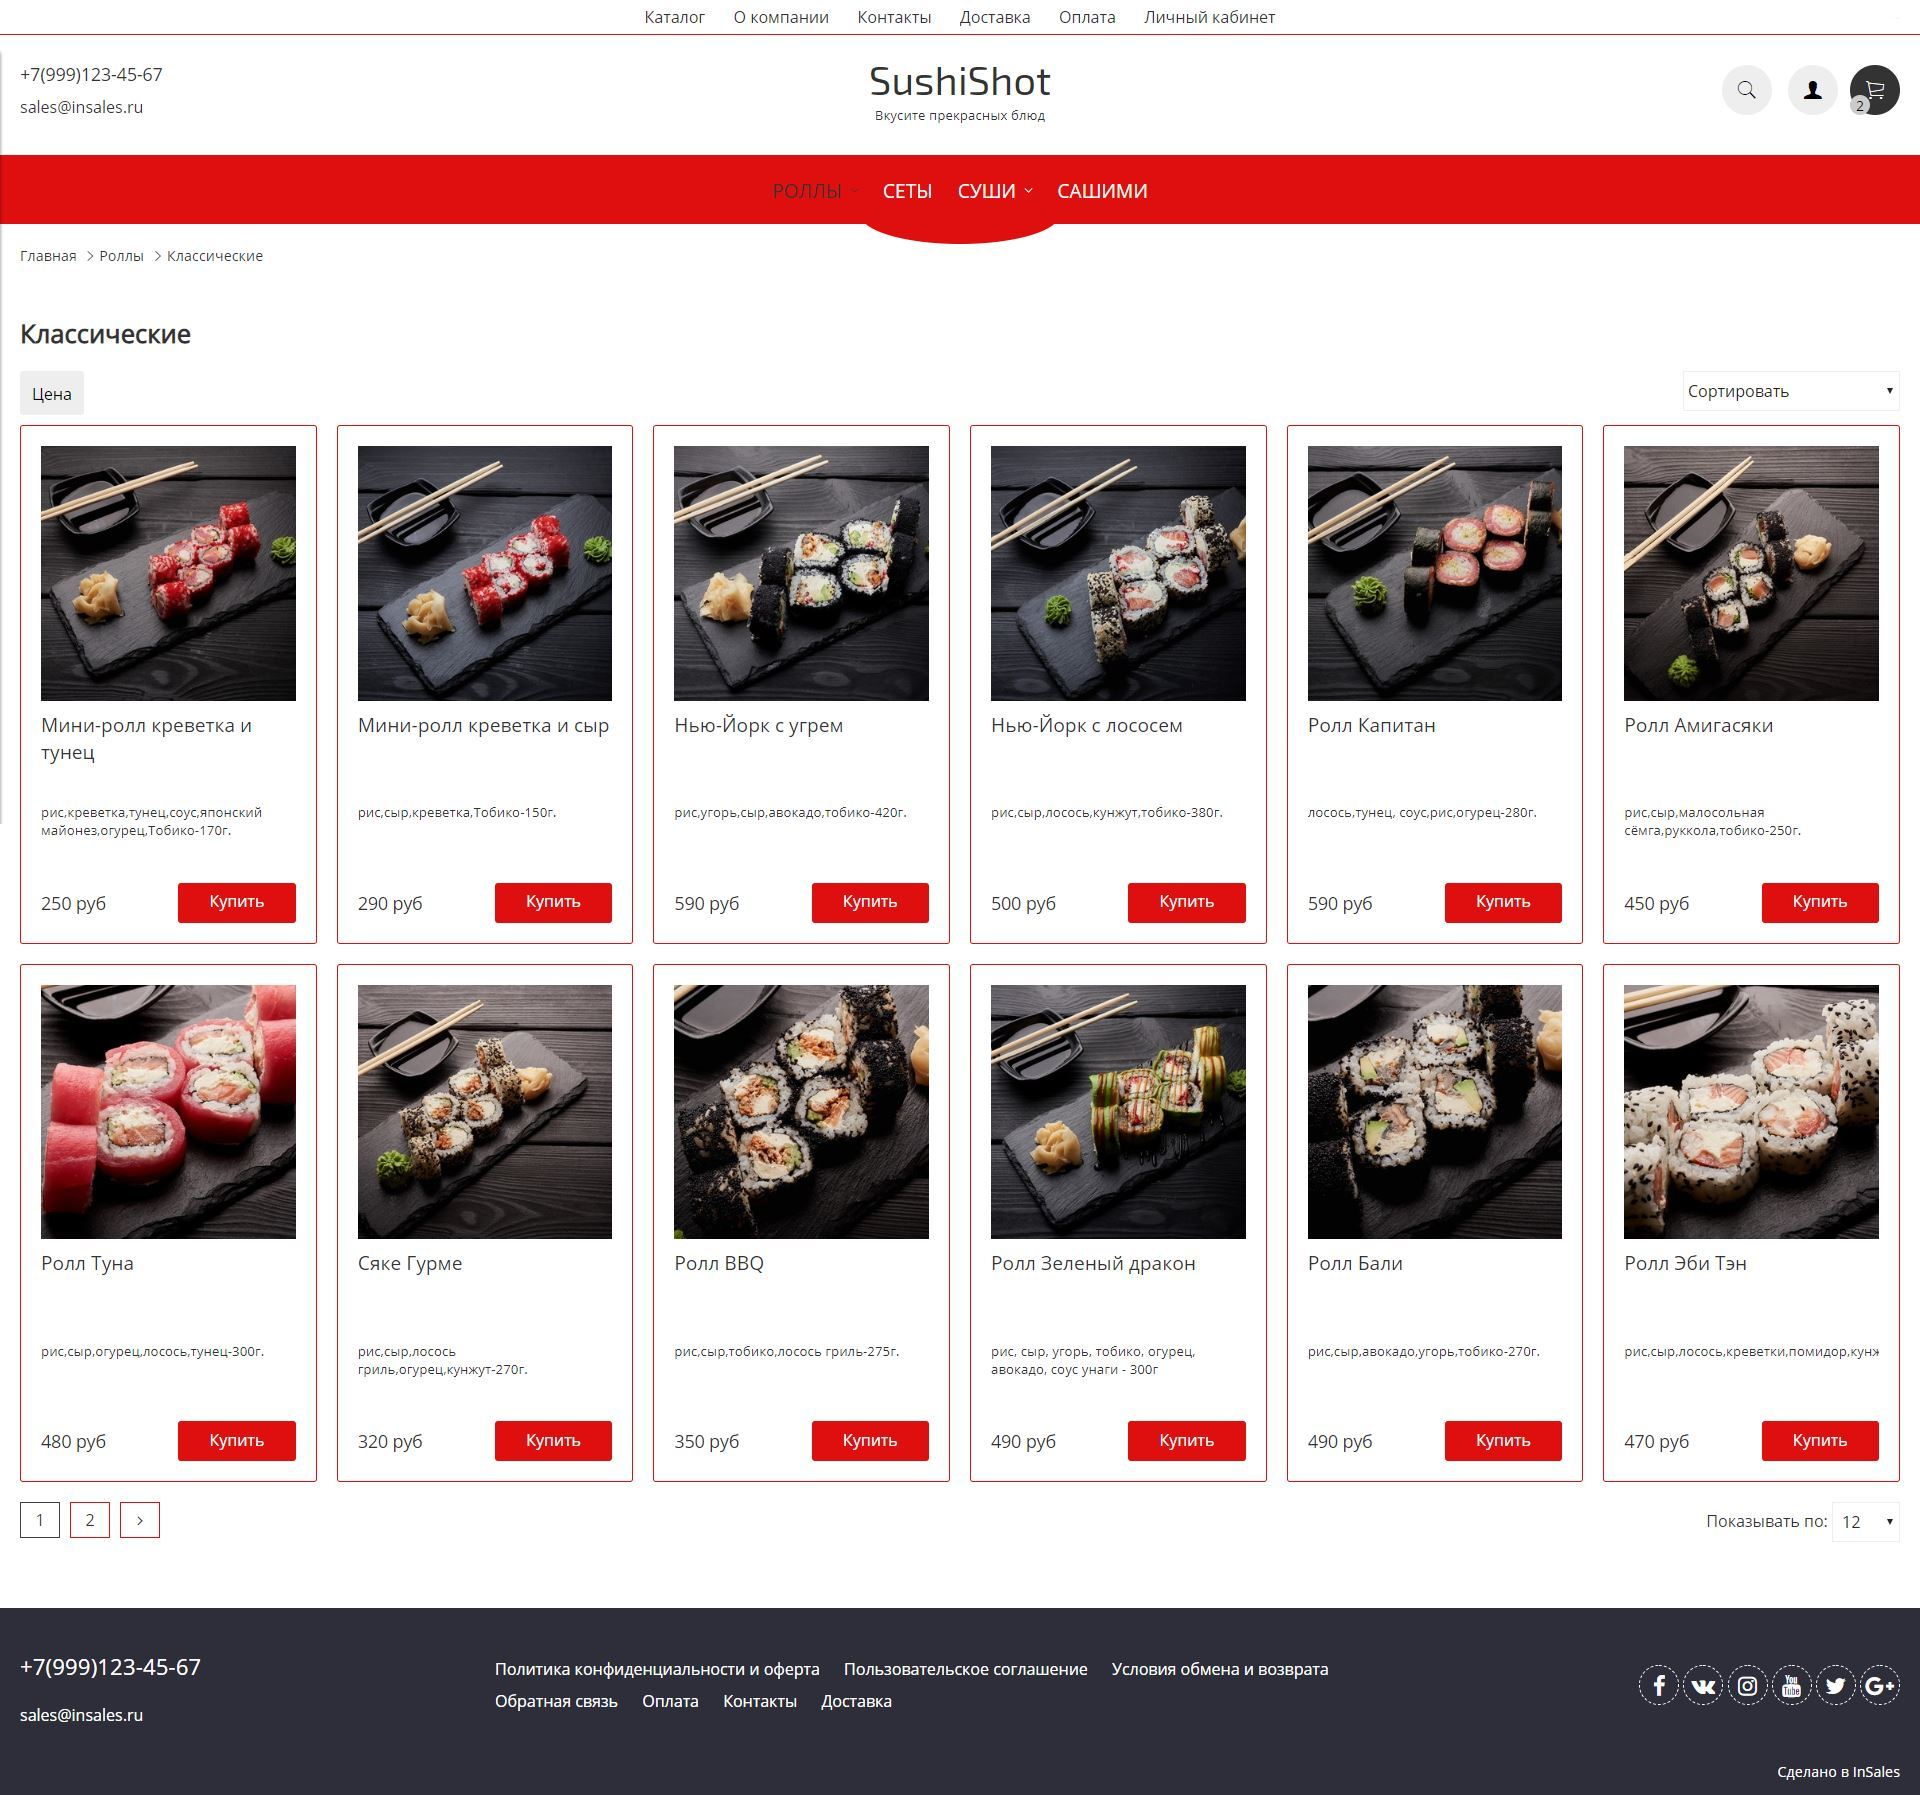 Шаблон интернет магазина - Суши Шот